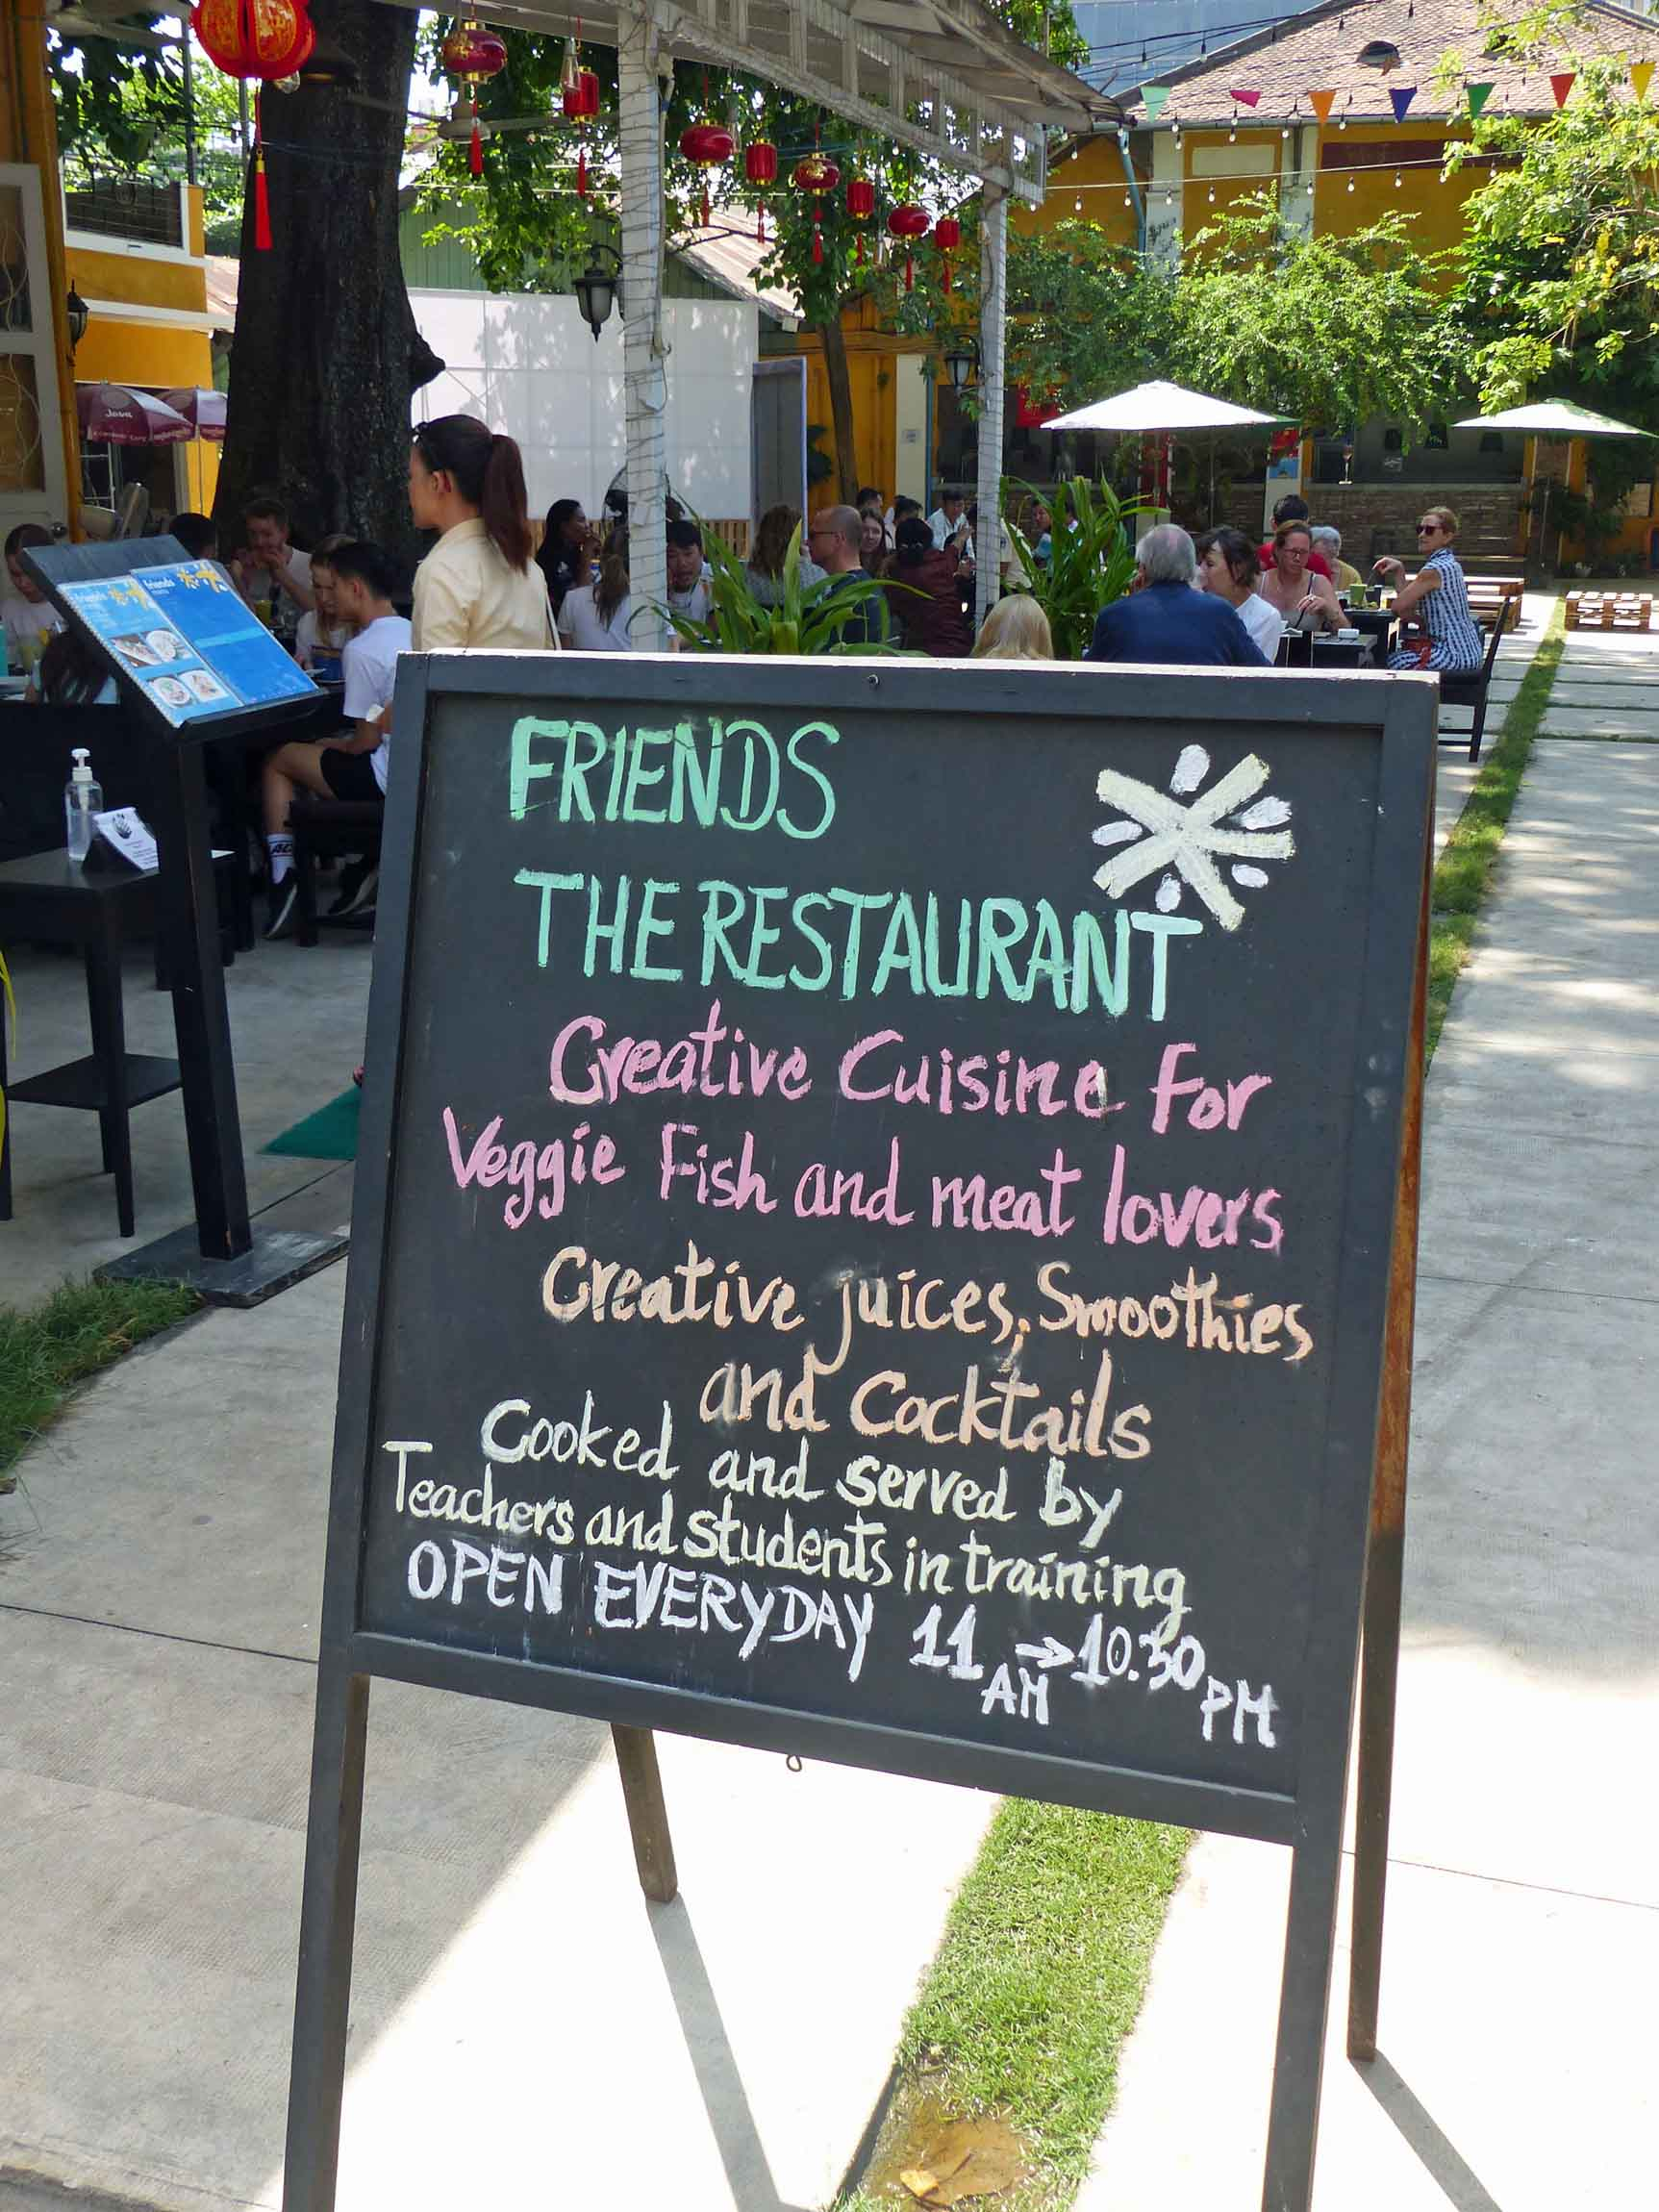 Blackboard sign outside a restaurant